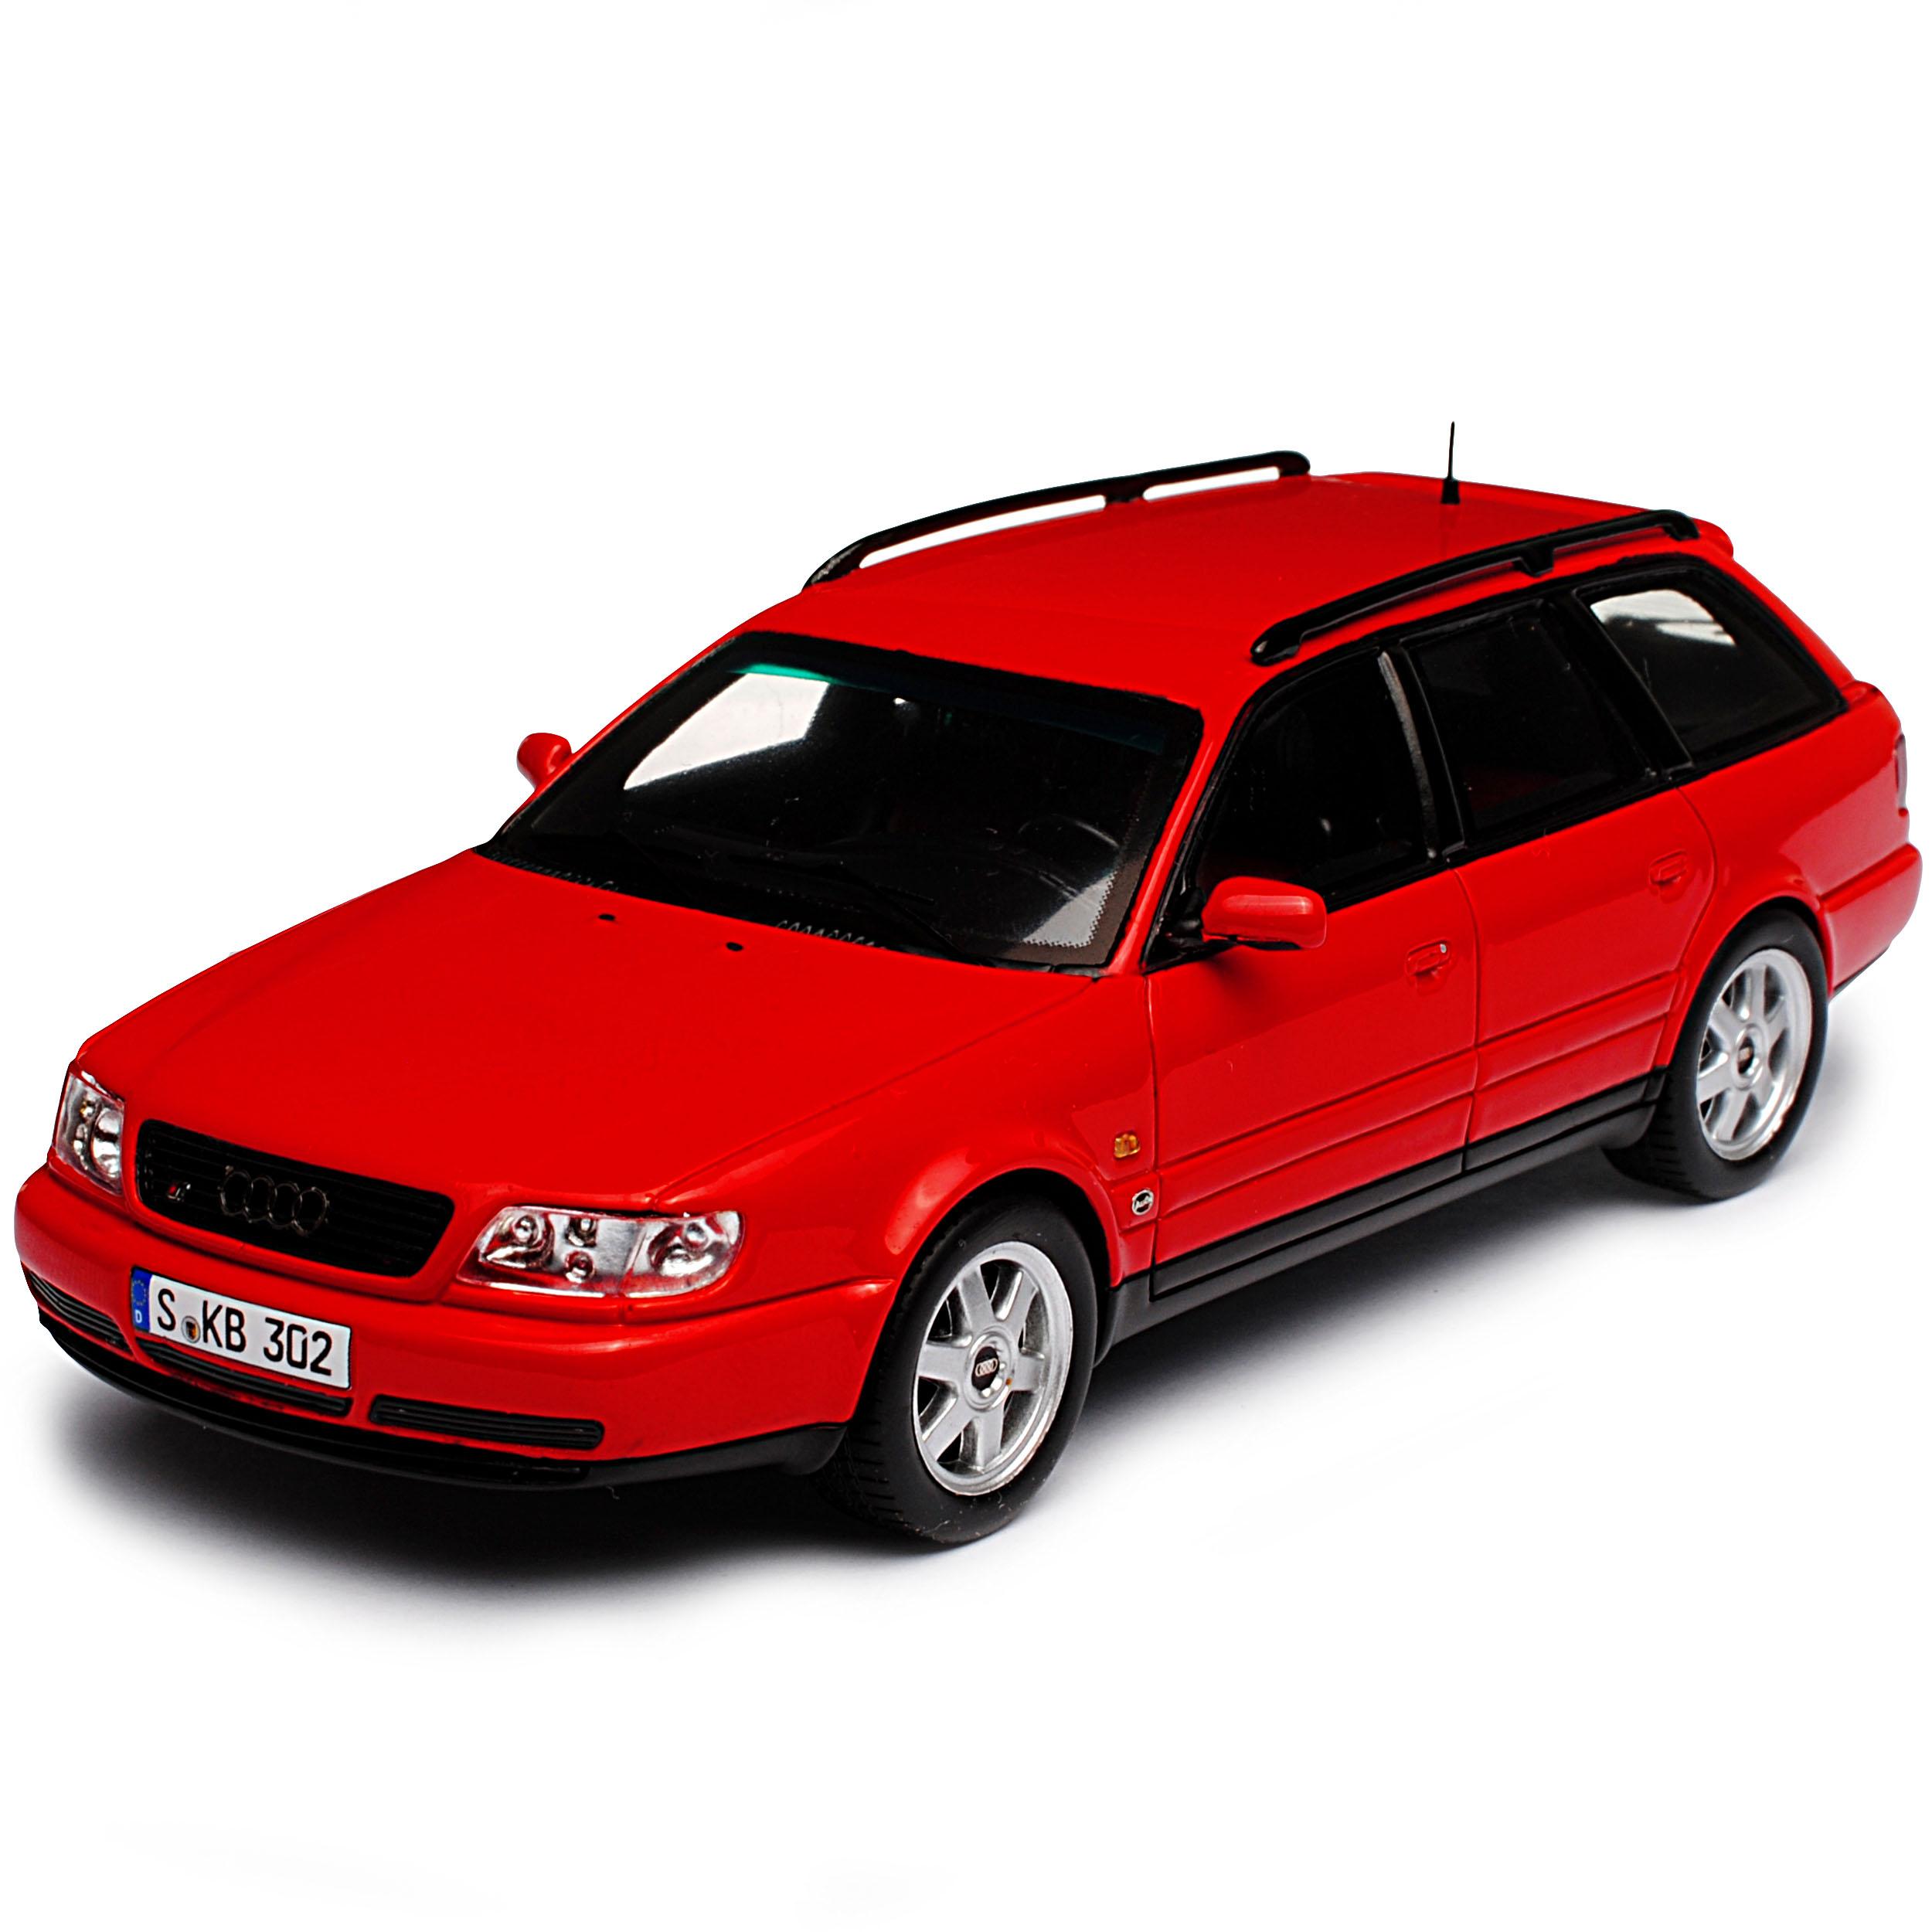 Audi 100 A6 C4 S6 Plus Avant Kombi Rot 4. Generation 1990-1997 1/43 Spark Mode.. | eBay